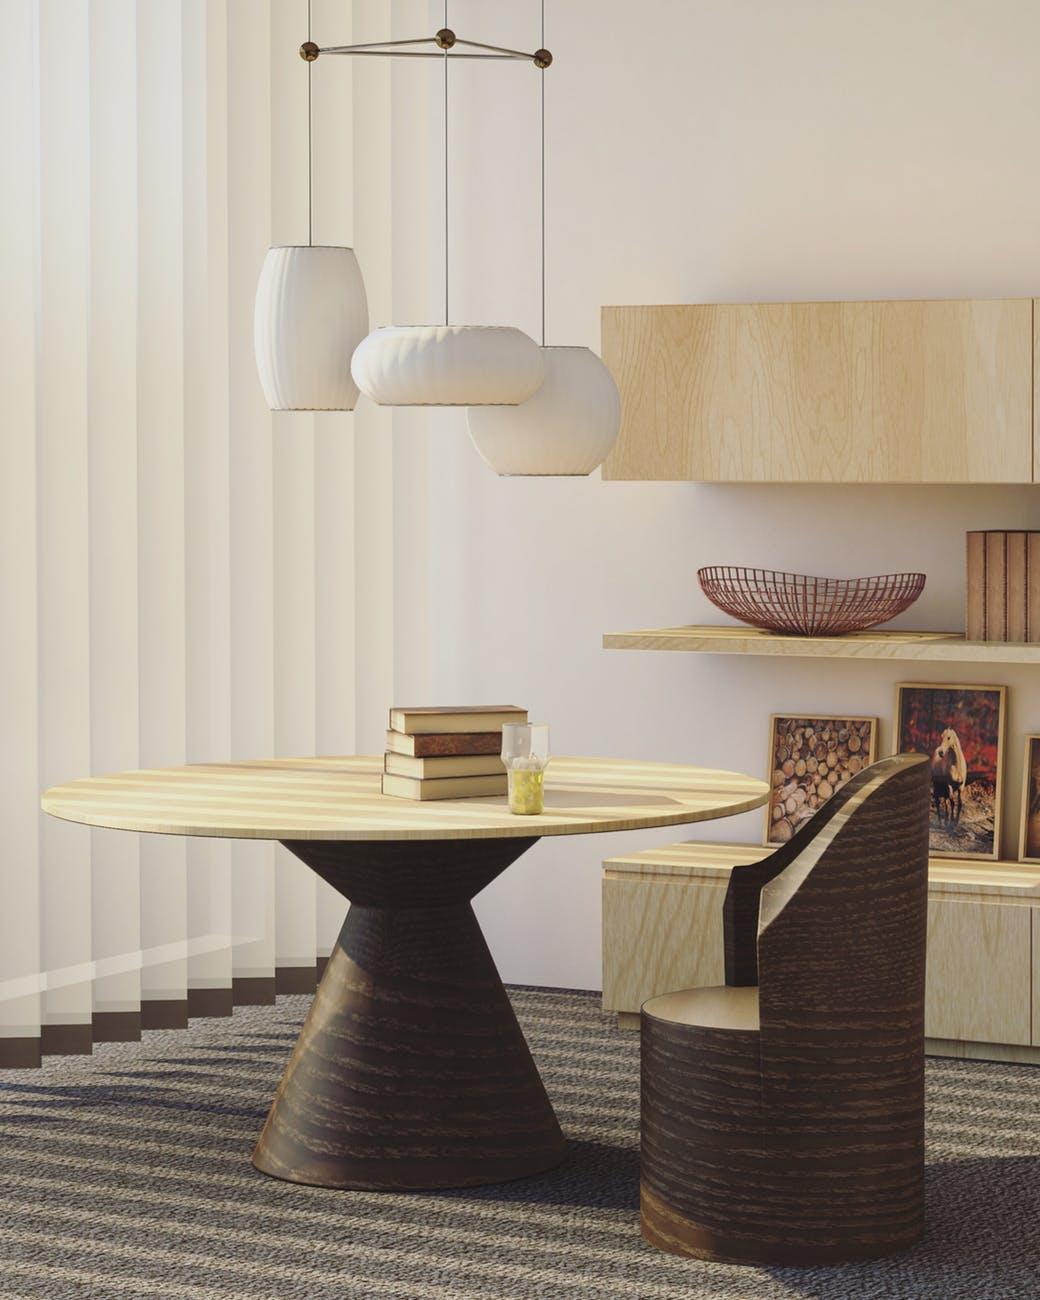 Beautiful Furnitures at Home.jpeg